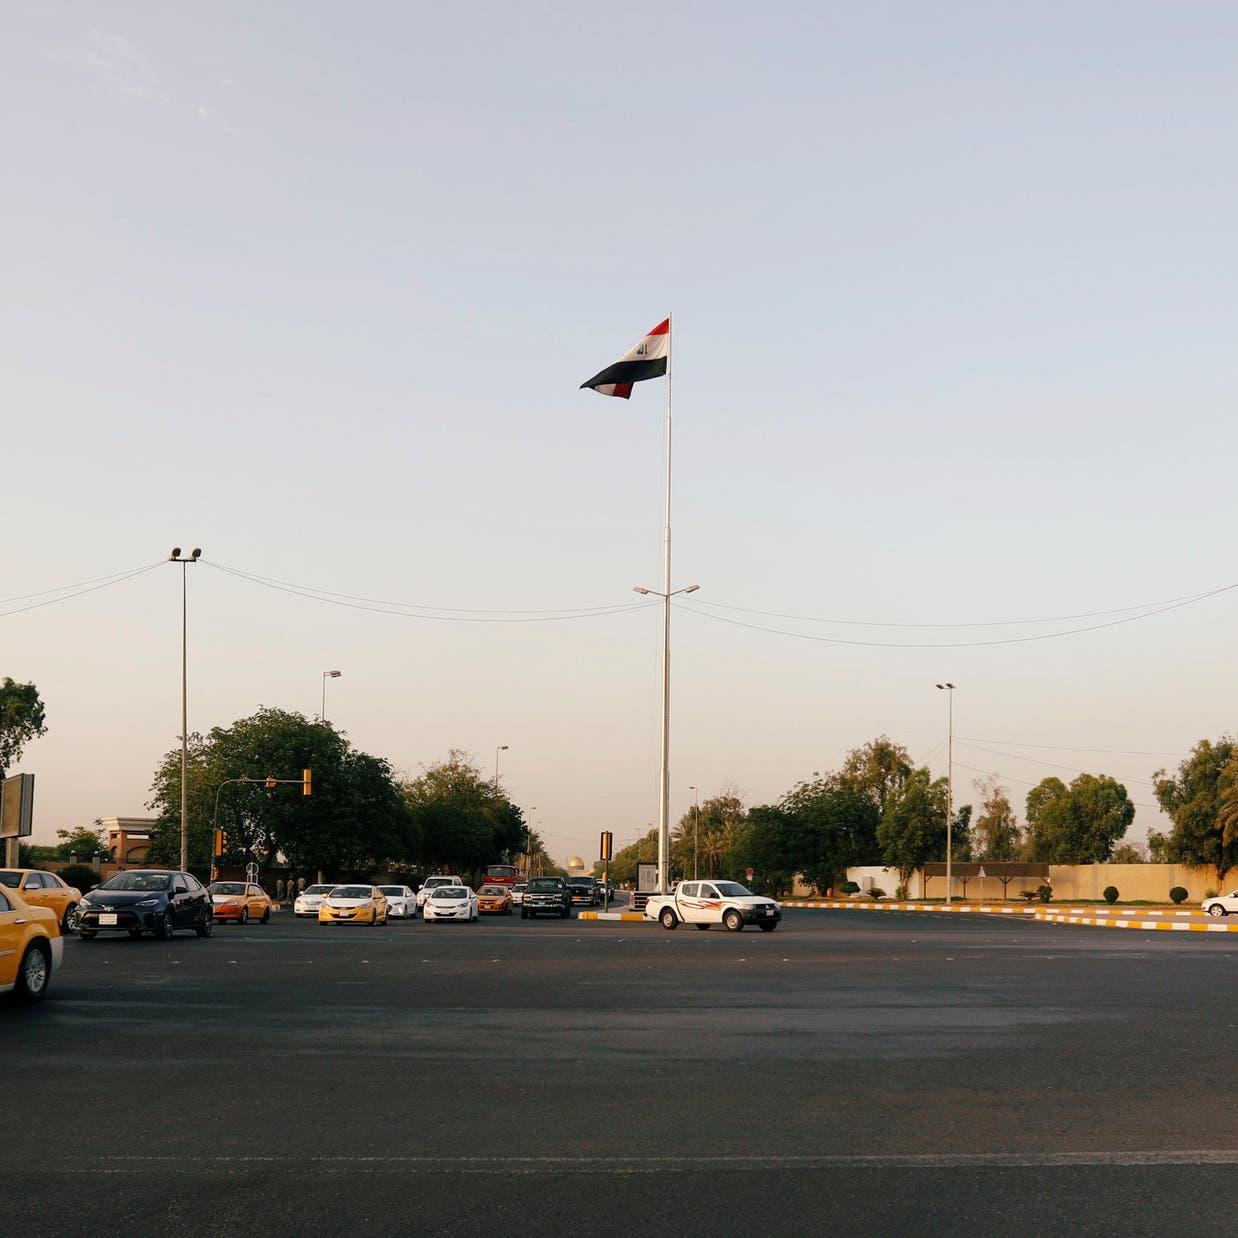 تفاصيل مداهمة بغداد.. اعتقالات وإحباط مخطط ضد سفارات